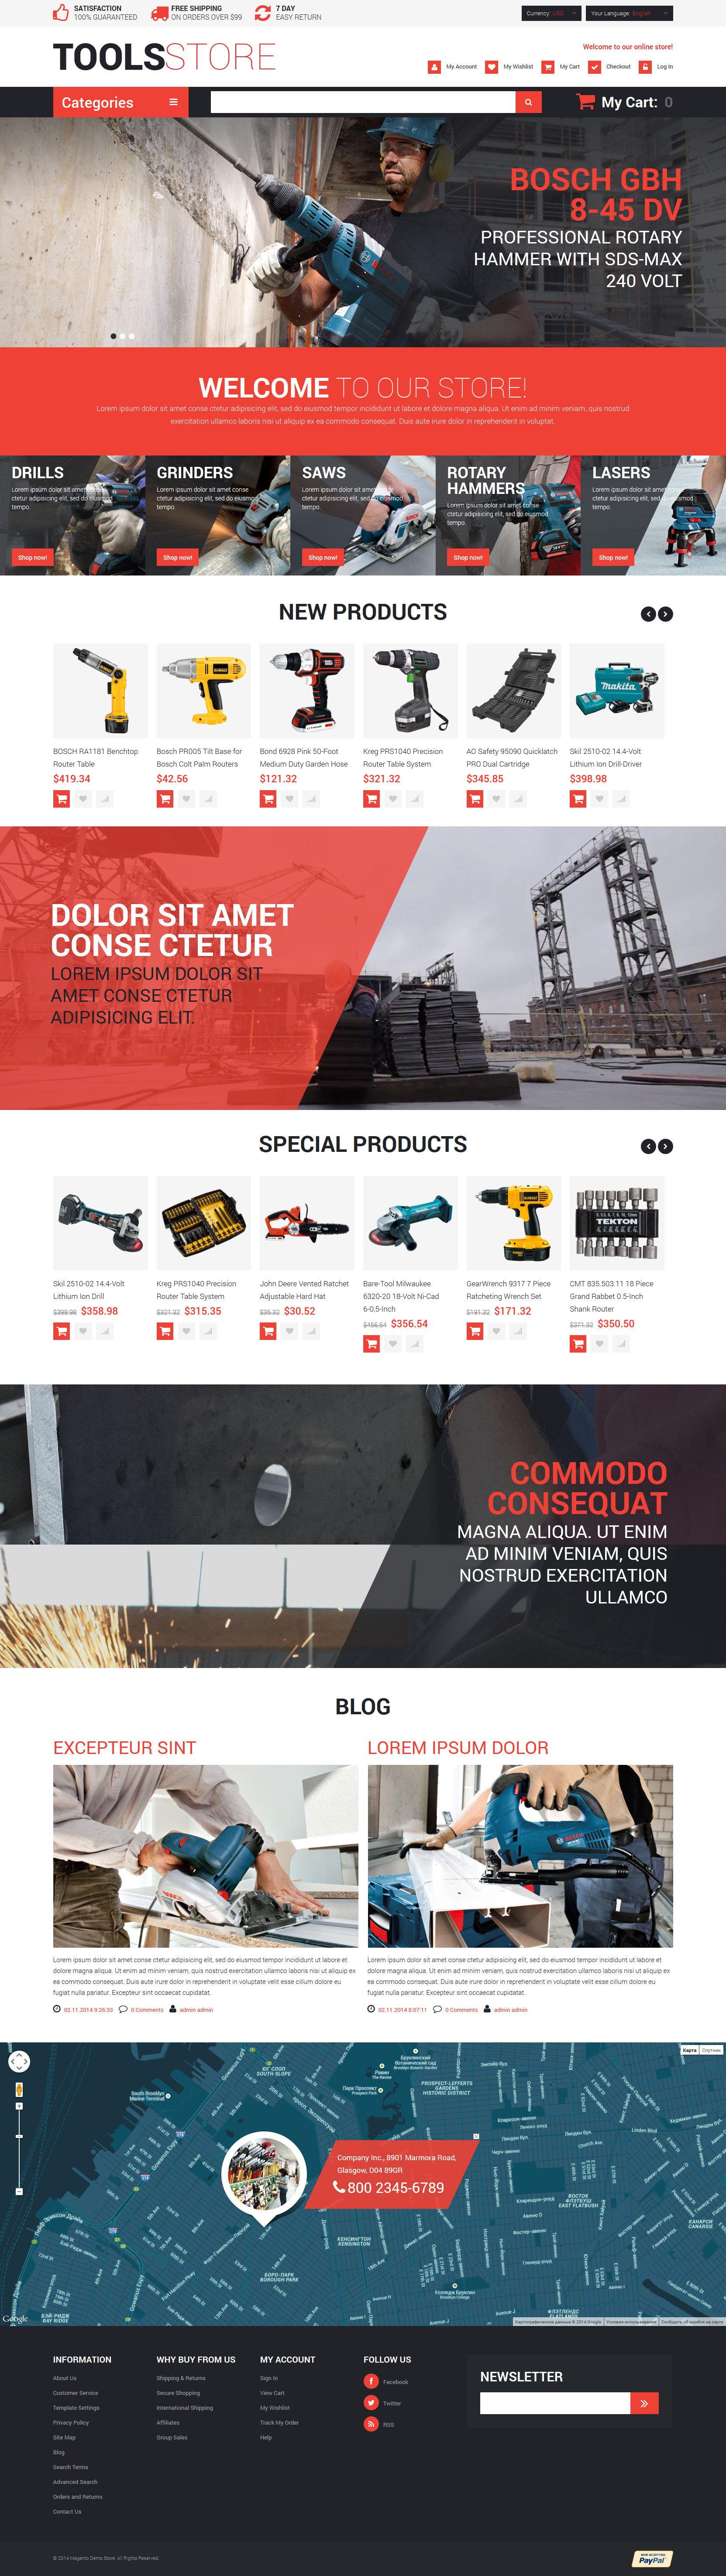 Contractor Tools Magento Theme